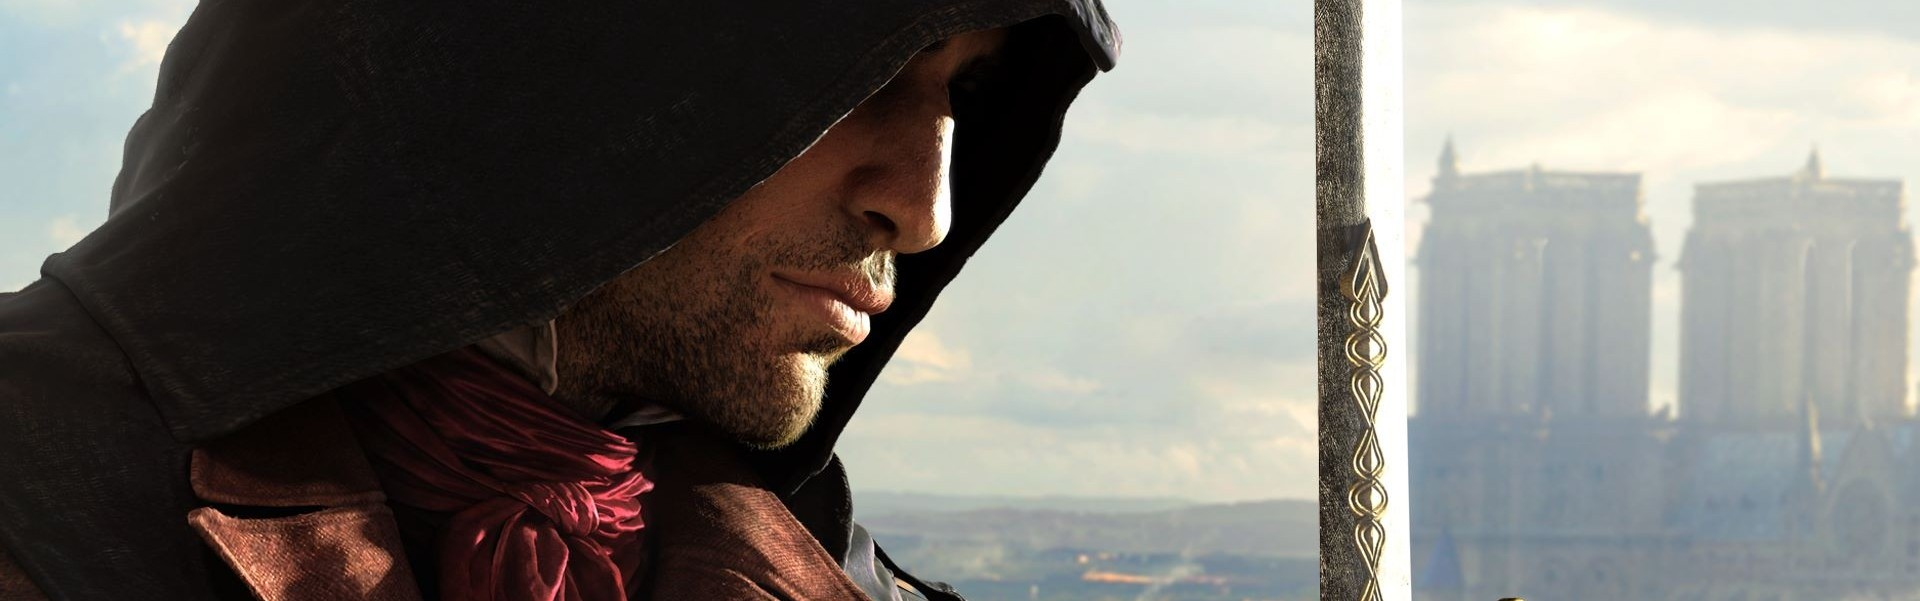 Assassin's Creed Origins - The Hidden Ones (DLC) Uplay Key EUROPE